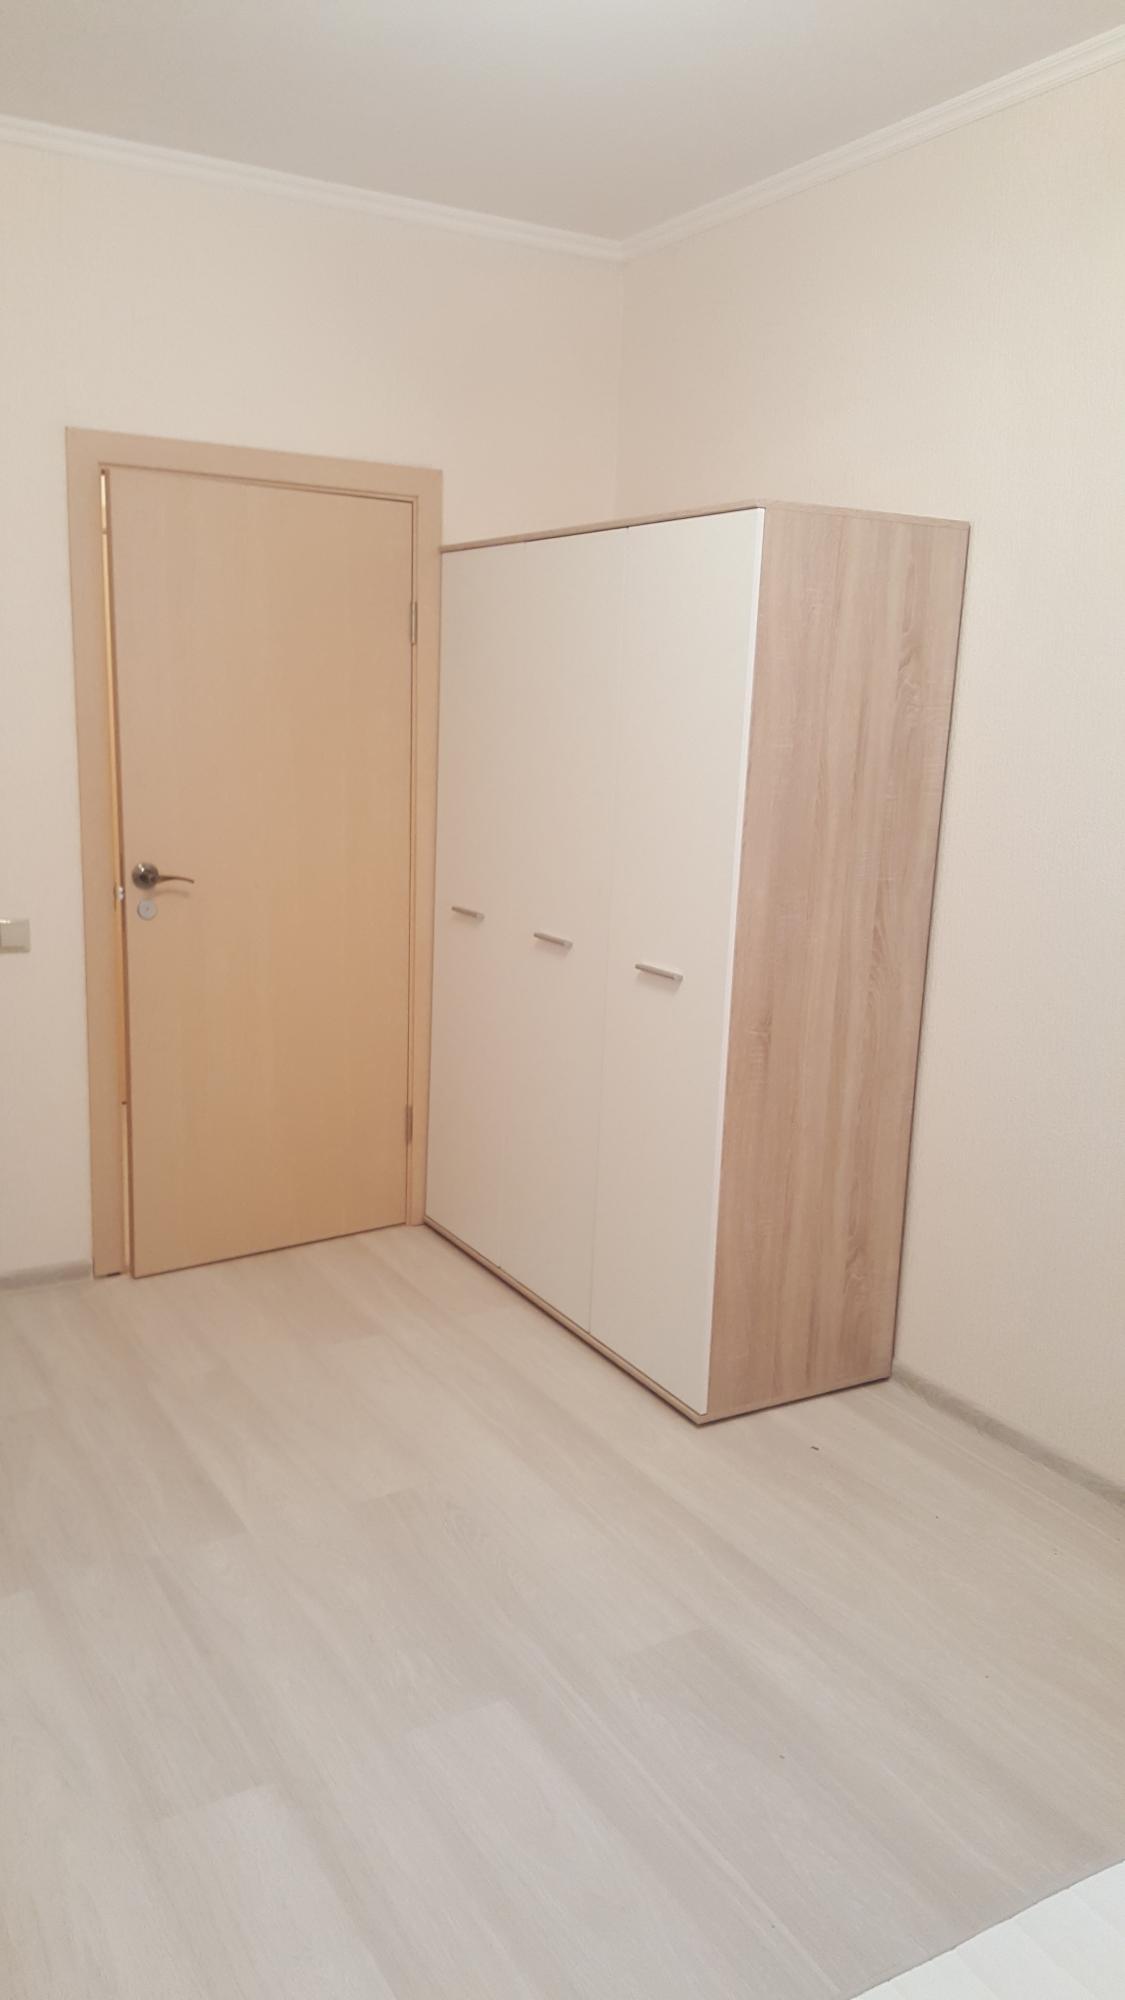 Квартира, 1 комната, 40 м² в Зеленограде 89776541696 купить 3